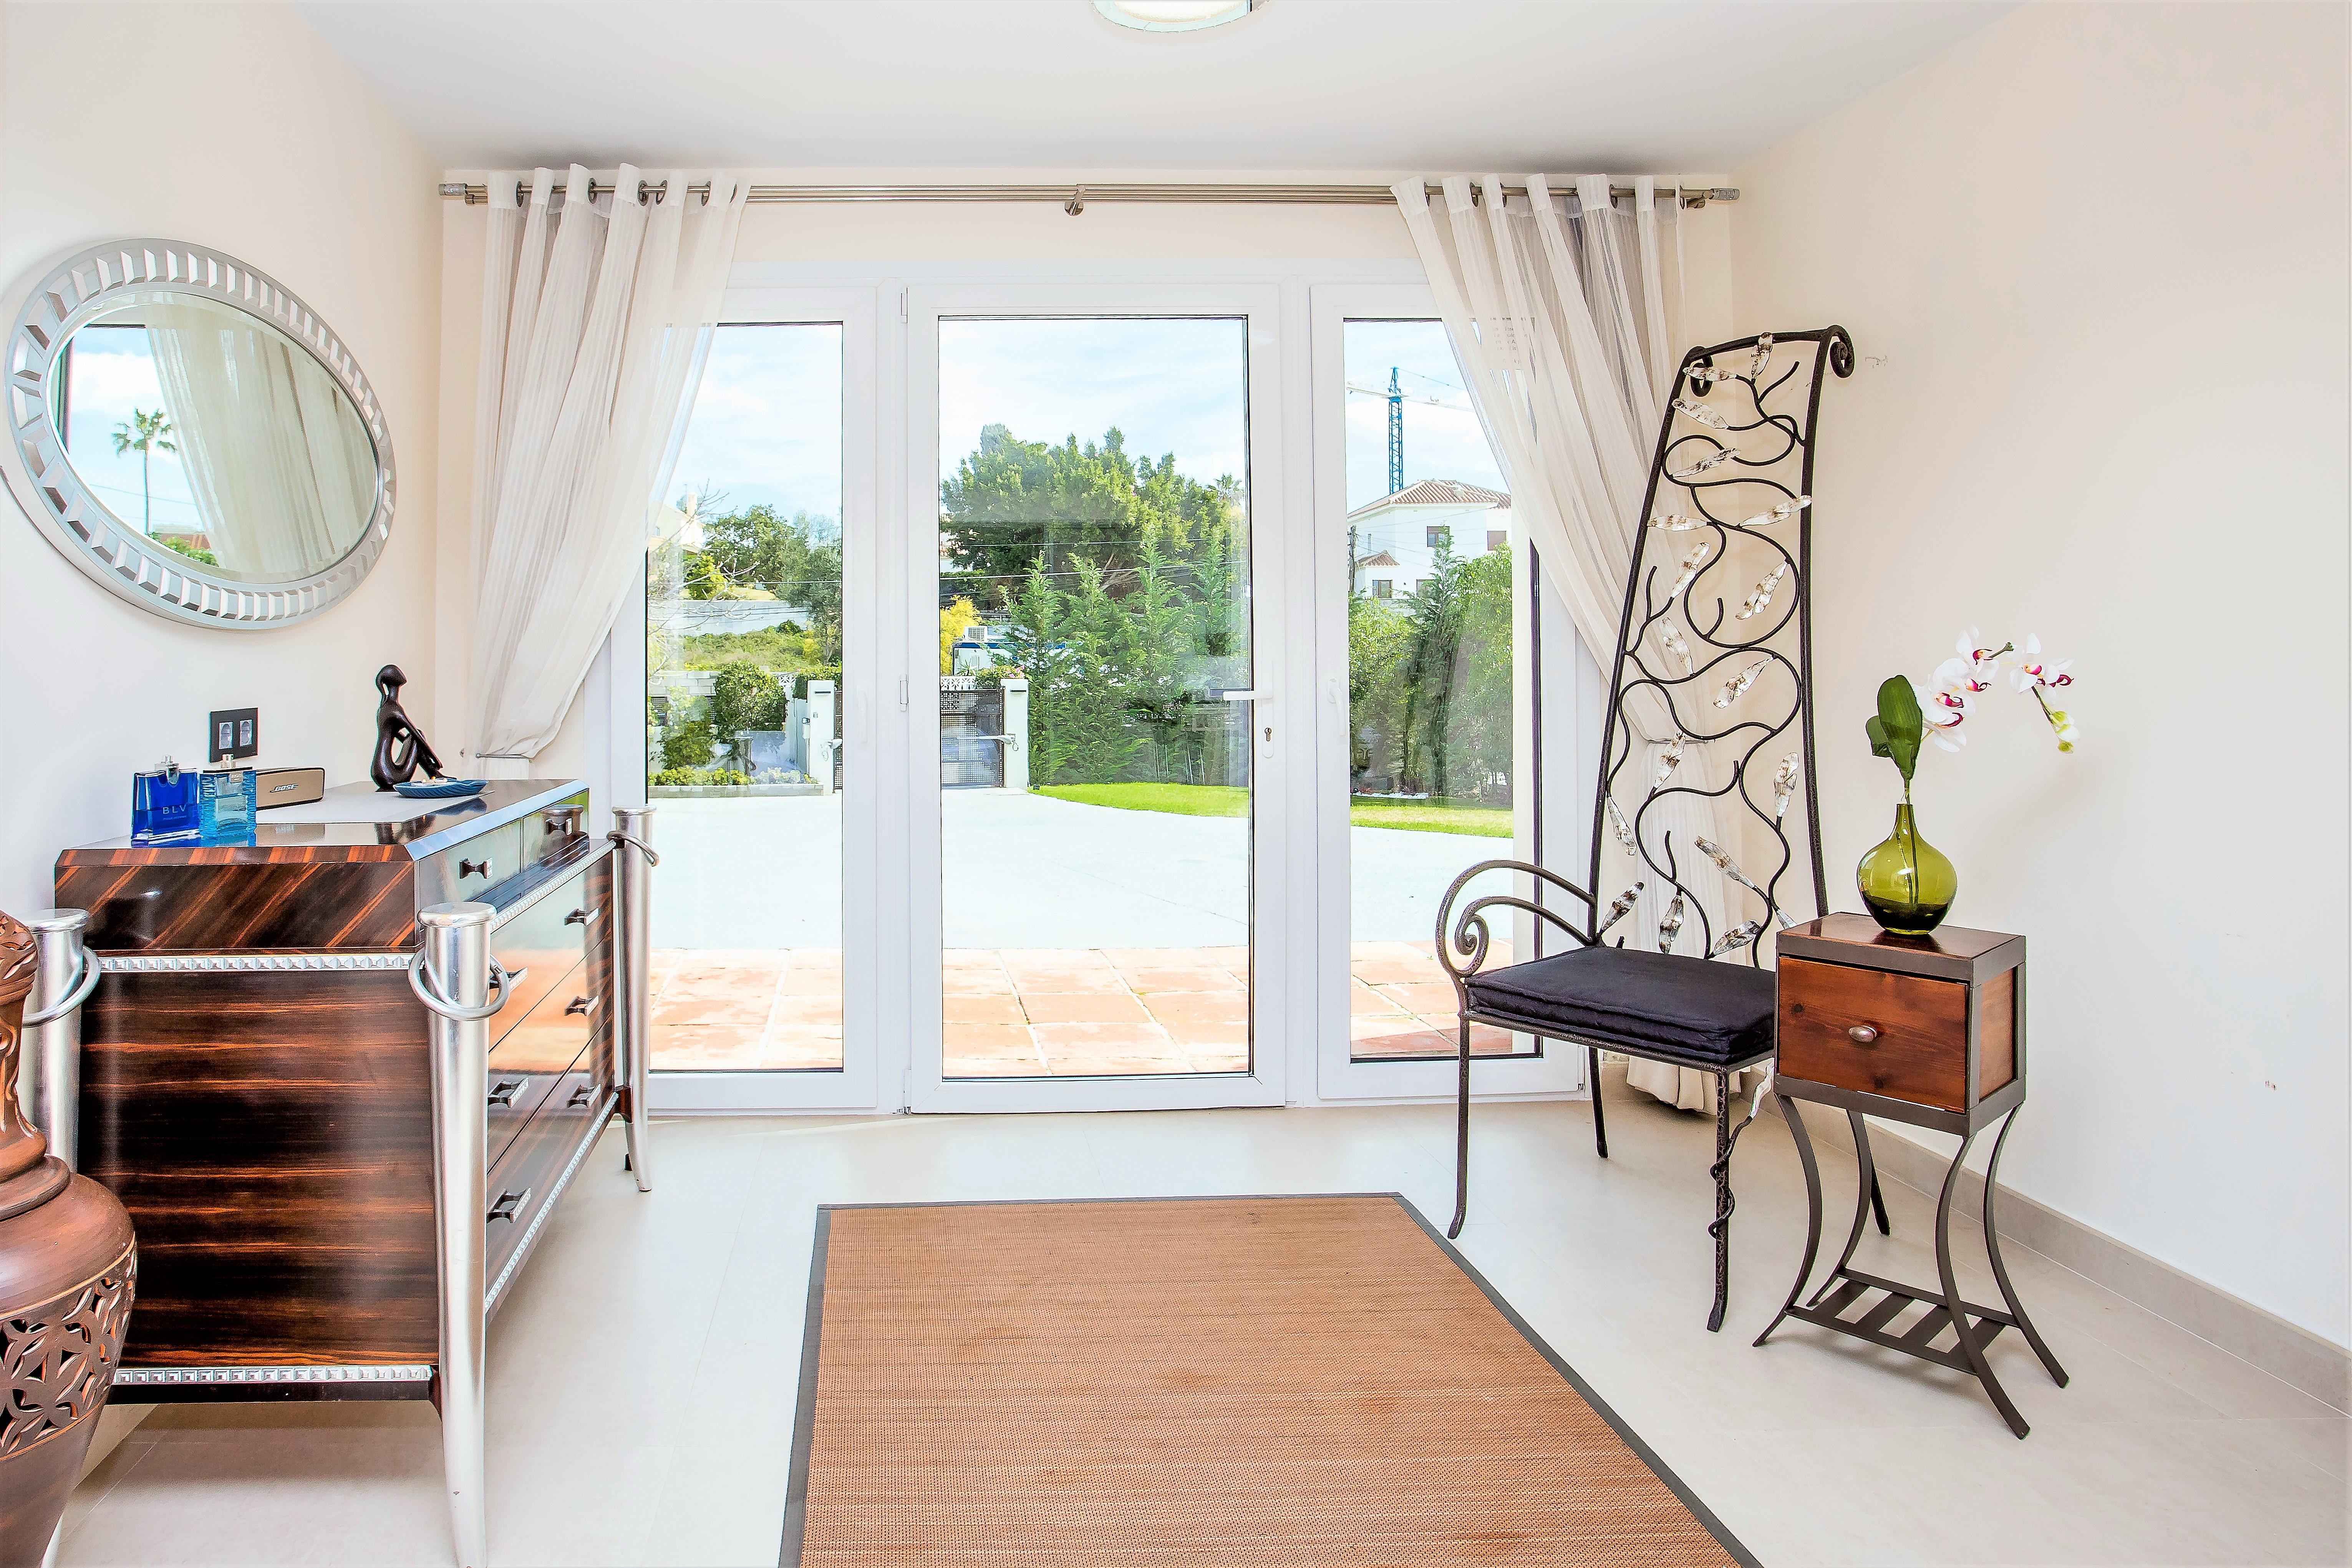 Apartment 8 Bedroom VILLA BY PUERTO BANUS   SEA 5 min                                photo 16956456